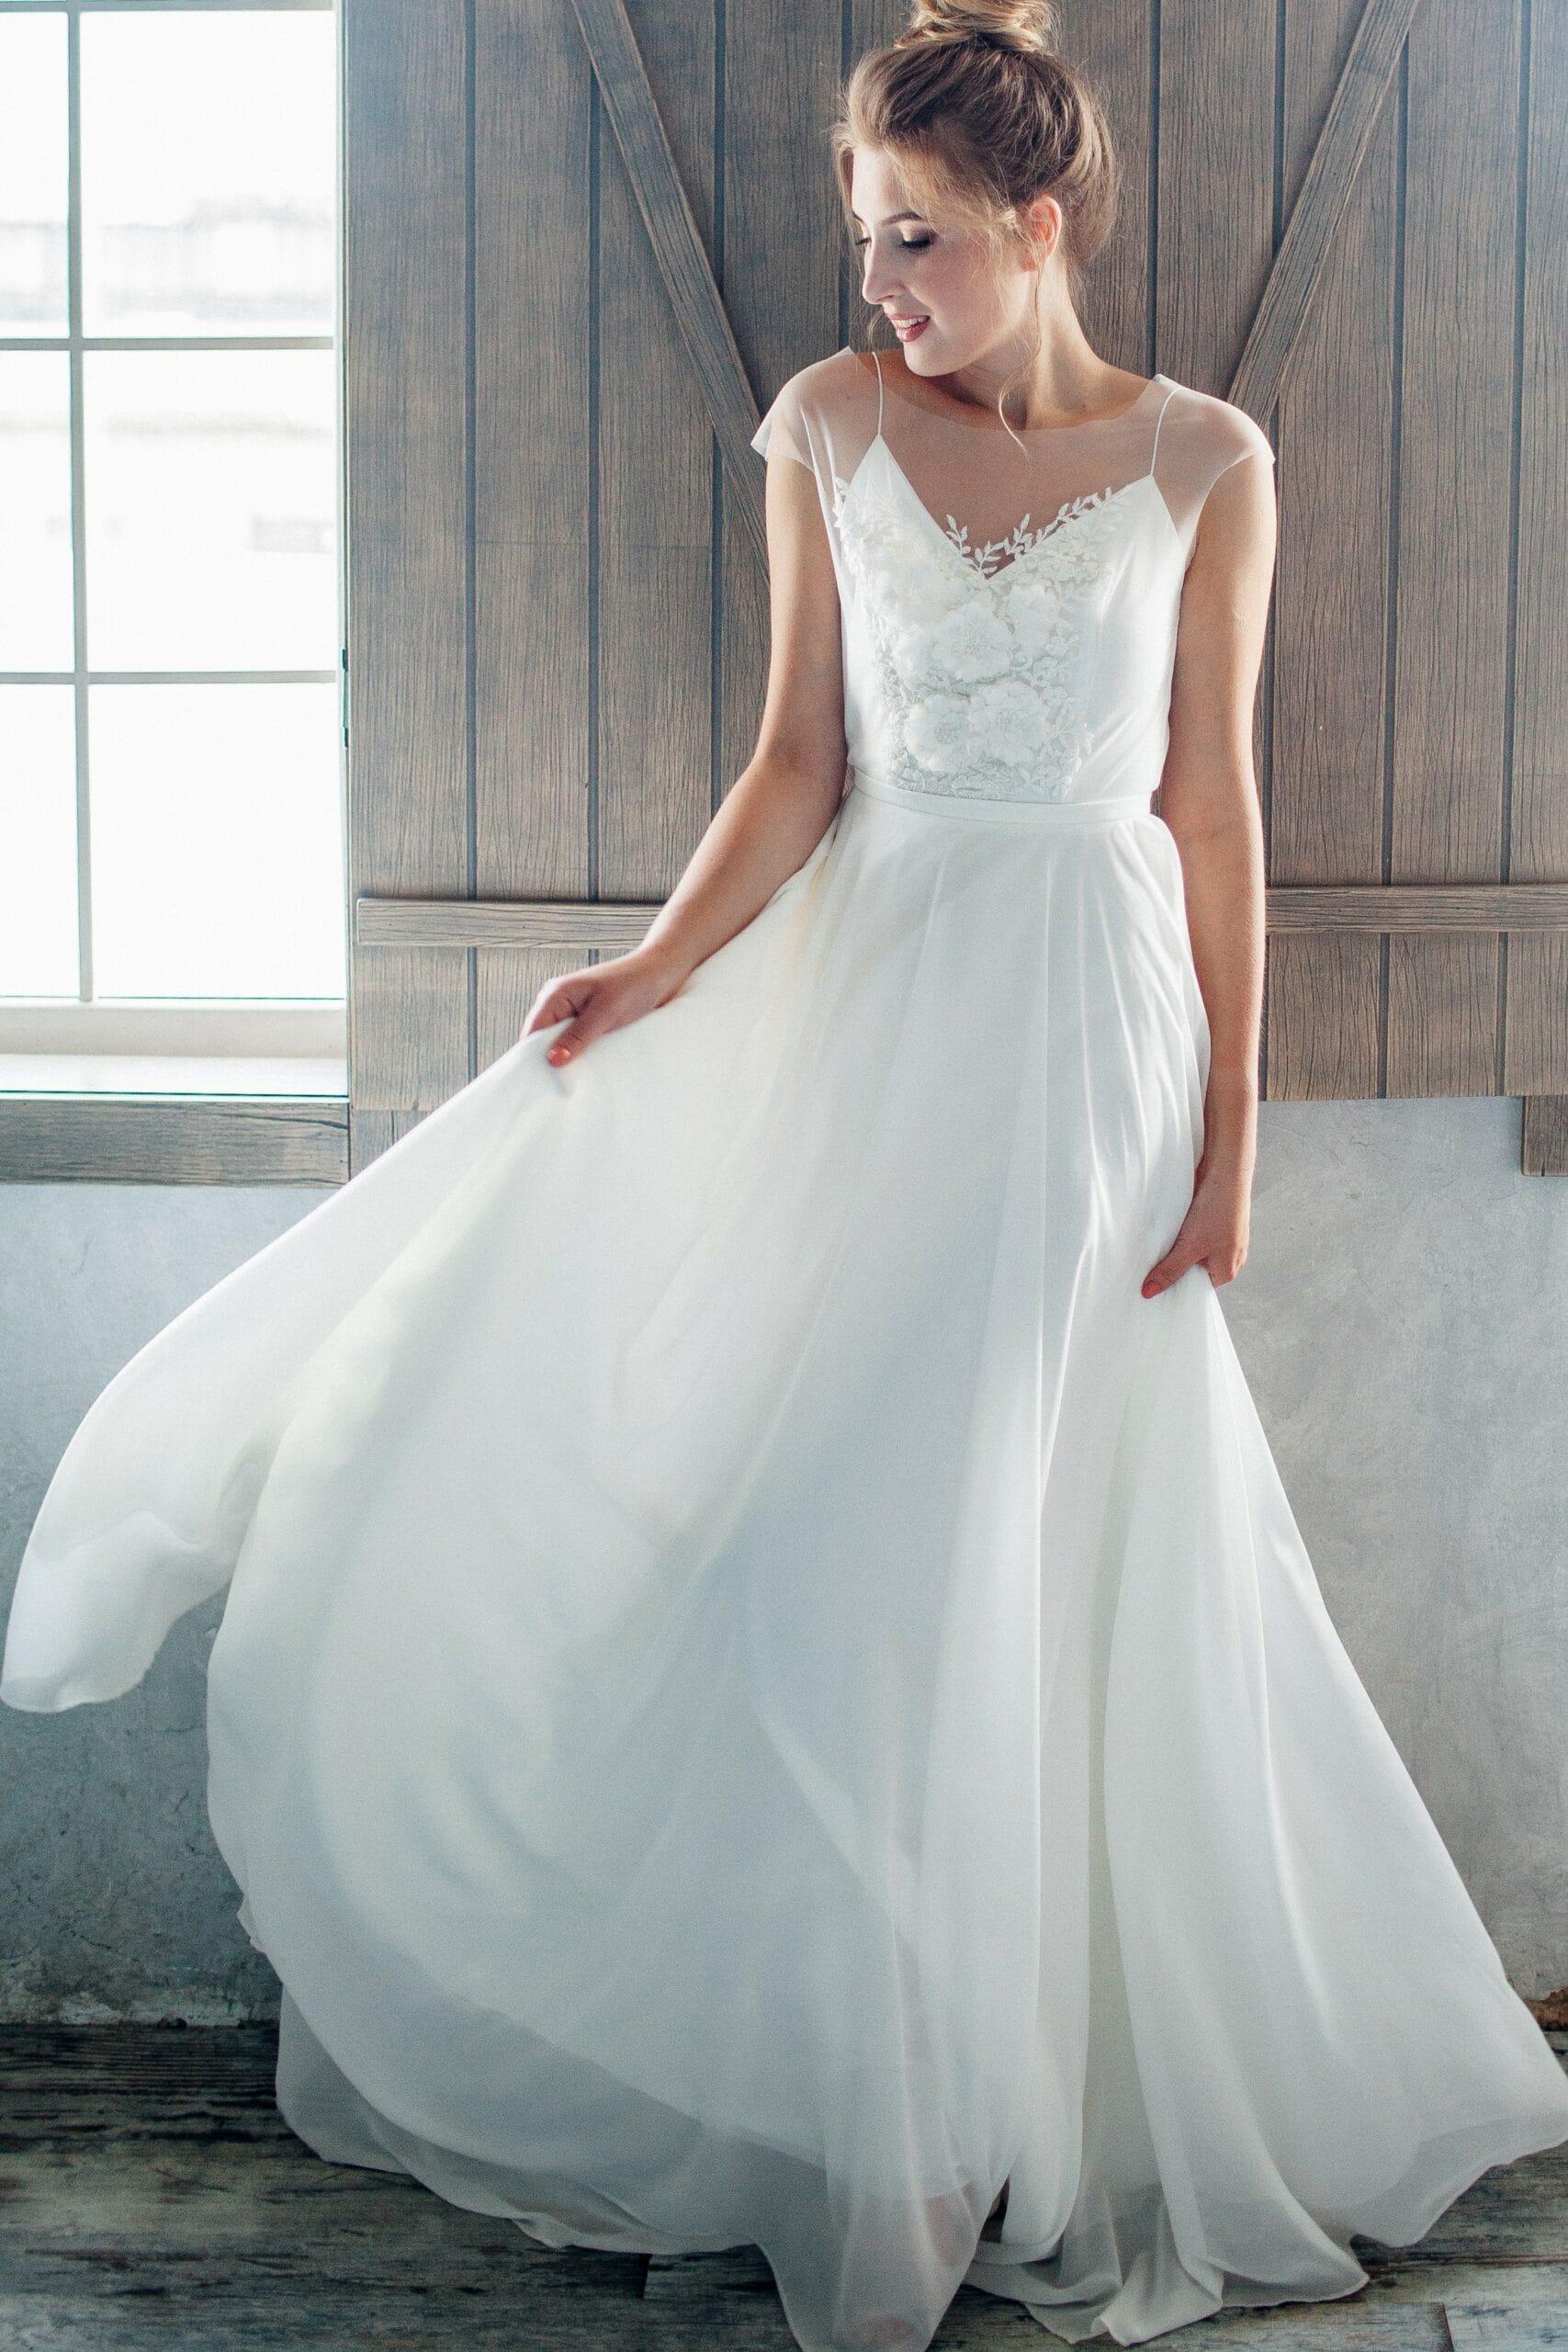 Свадебное платье ZARALLA, коллекция THE ANGELS, бренд RARE BRIDAL, фото 4